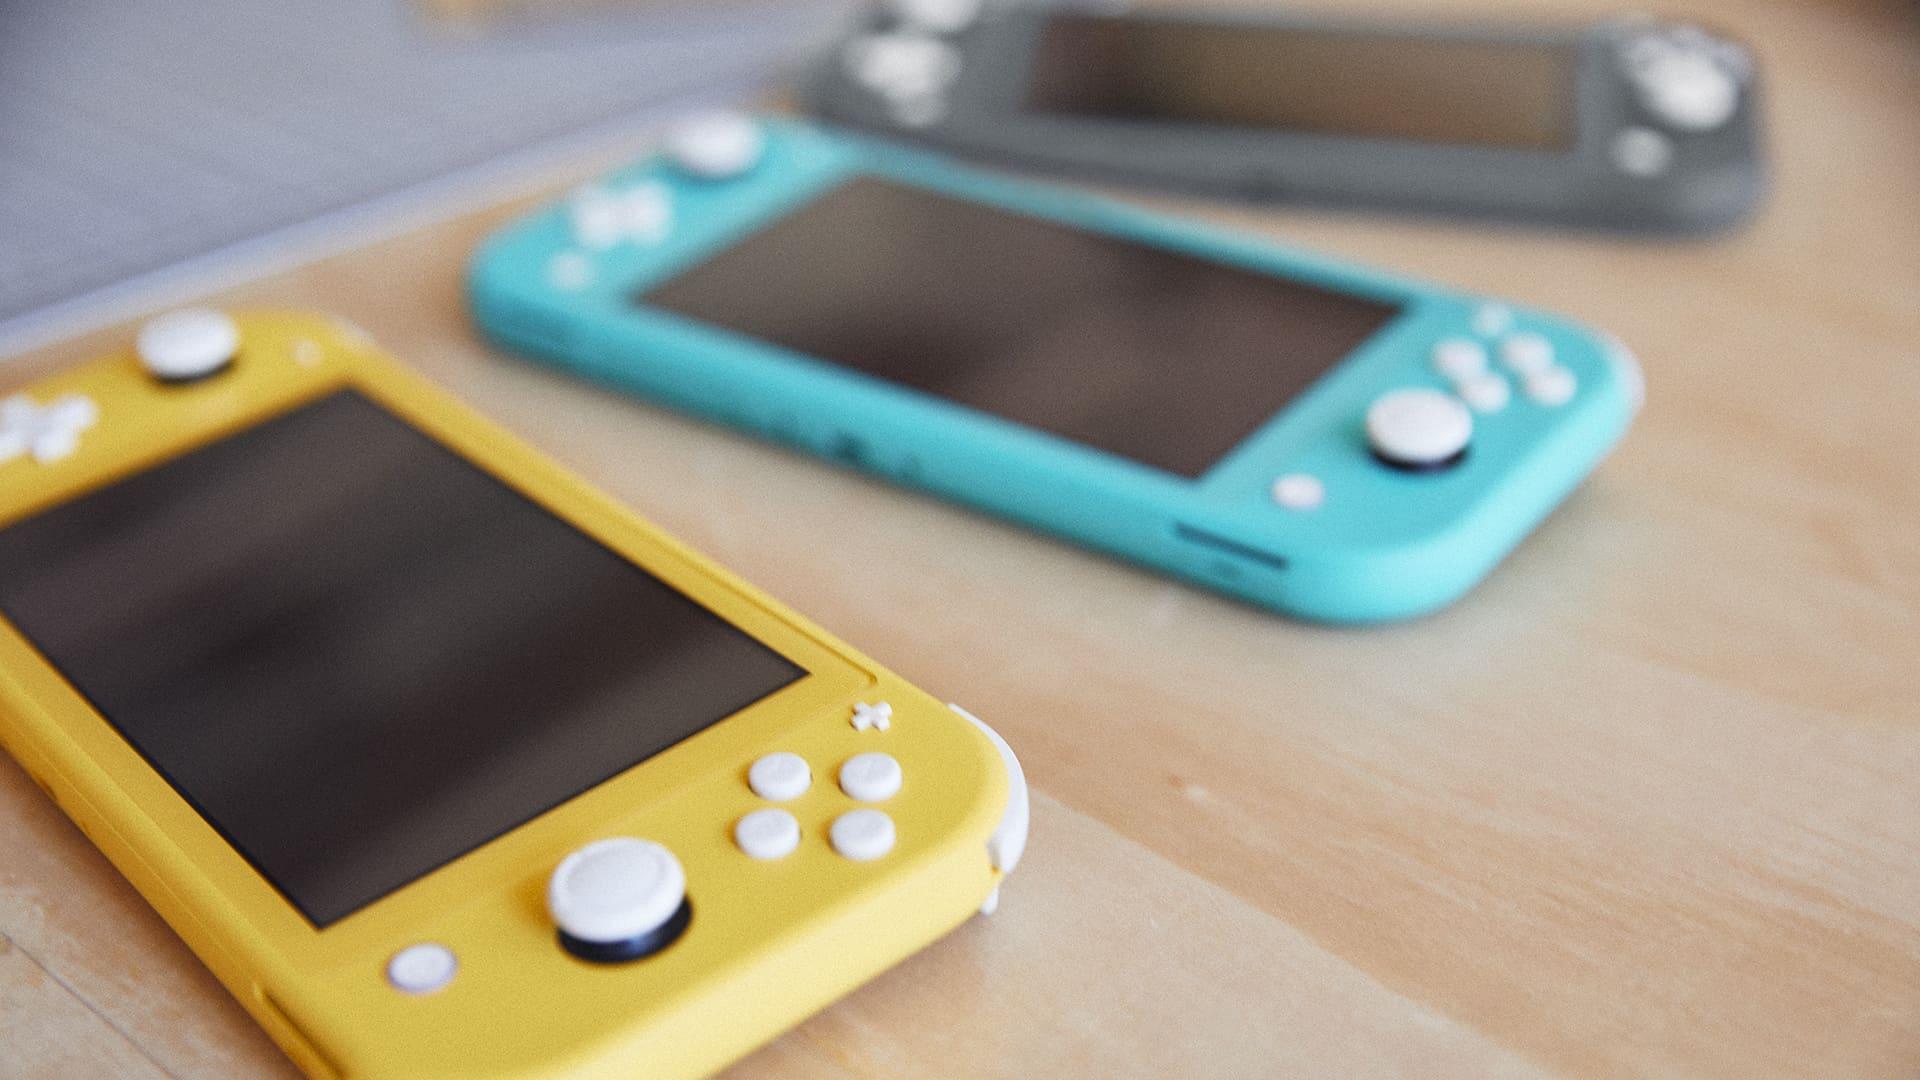 Nintendo Switch Lite Announced